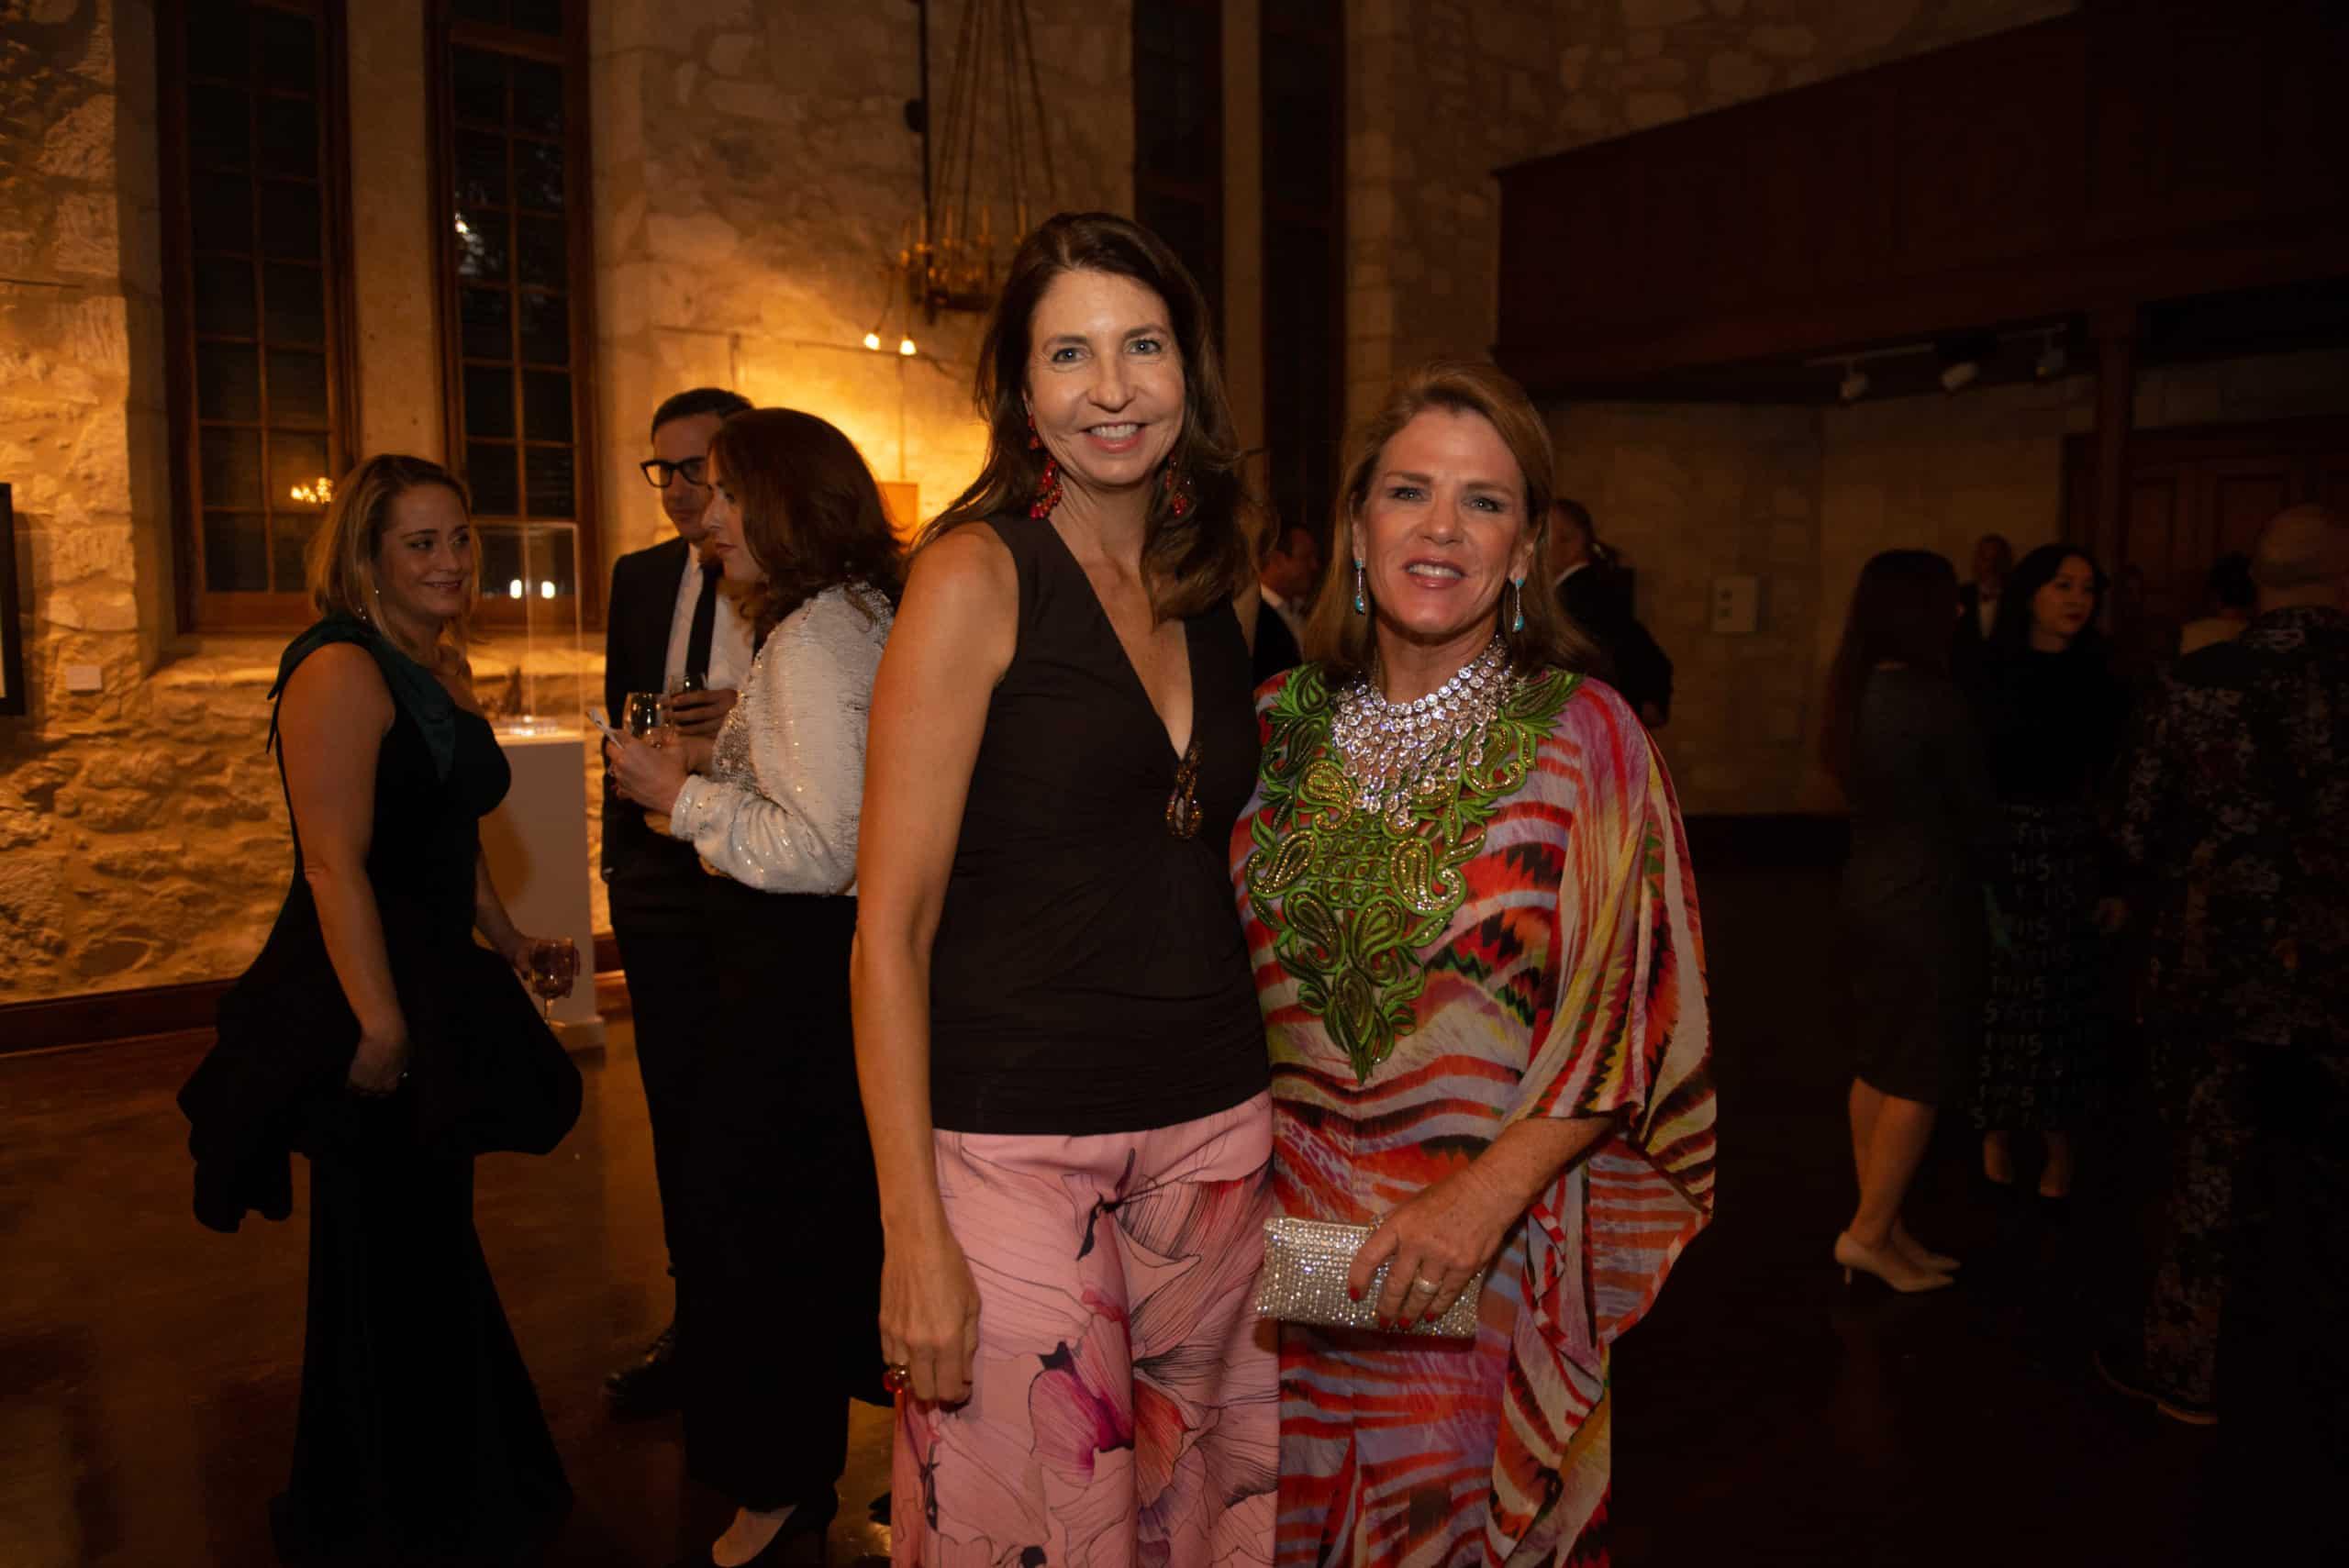 Francie Mannix and Bonnie Chumbley